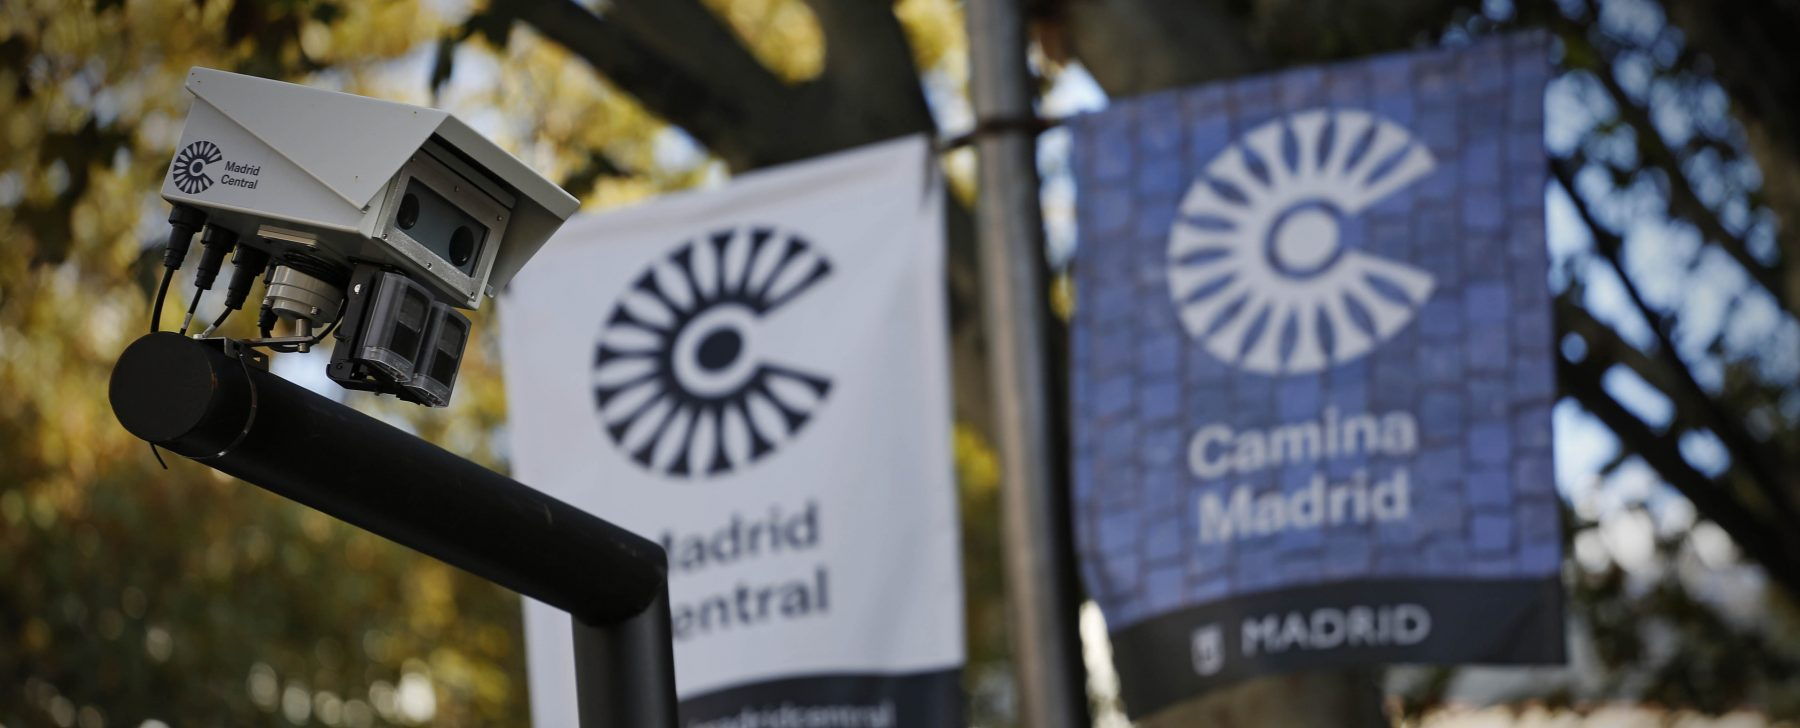 camaras Madrid Central